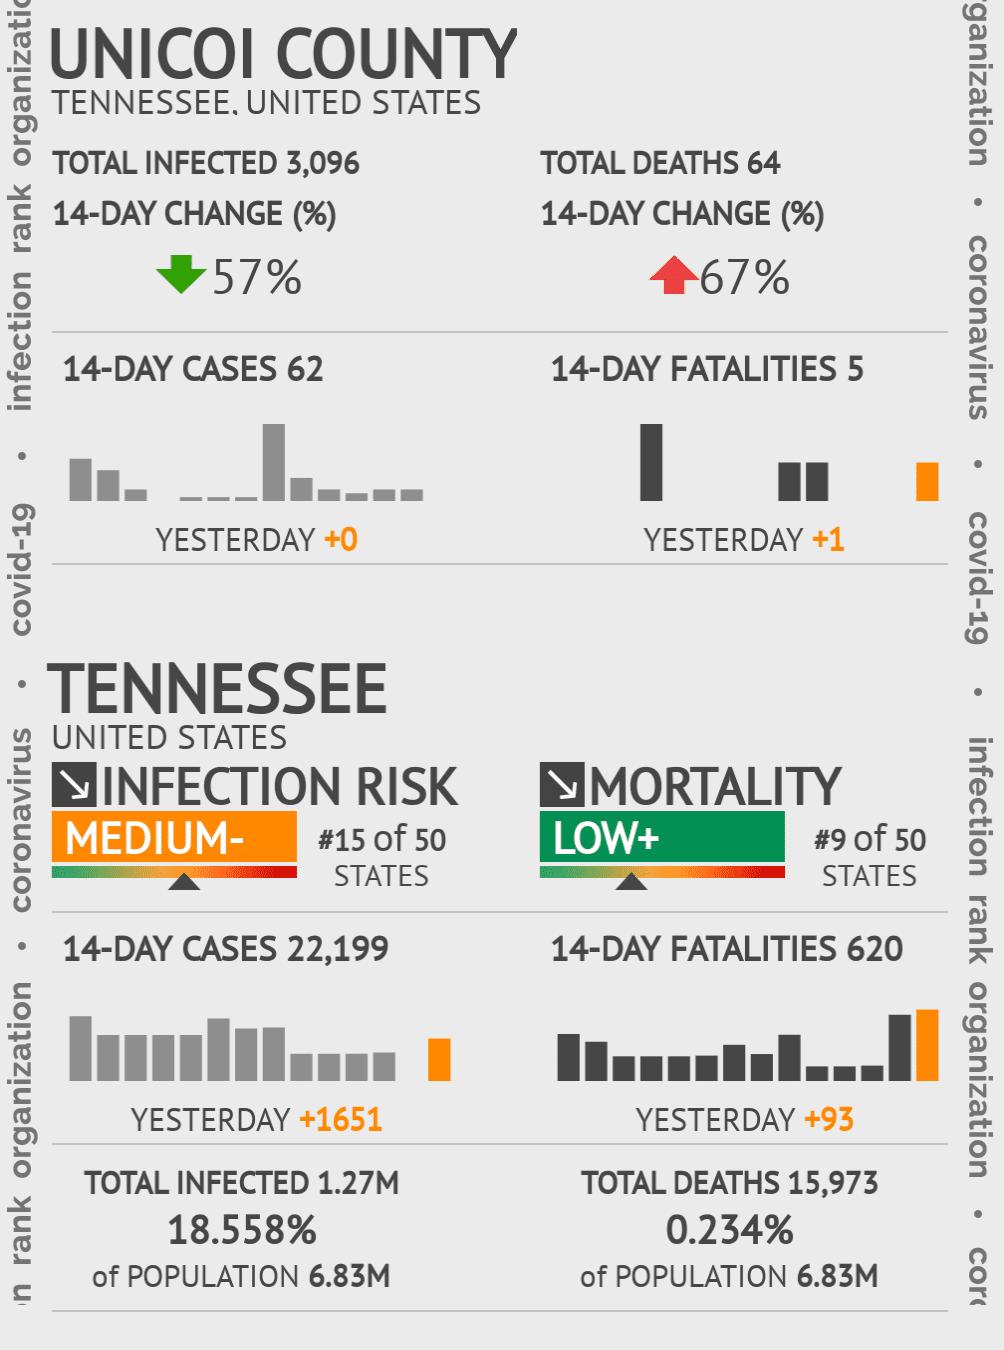 Unicoi County Coronavirus Covid-19 Risk of Infection on November 27, 2020